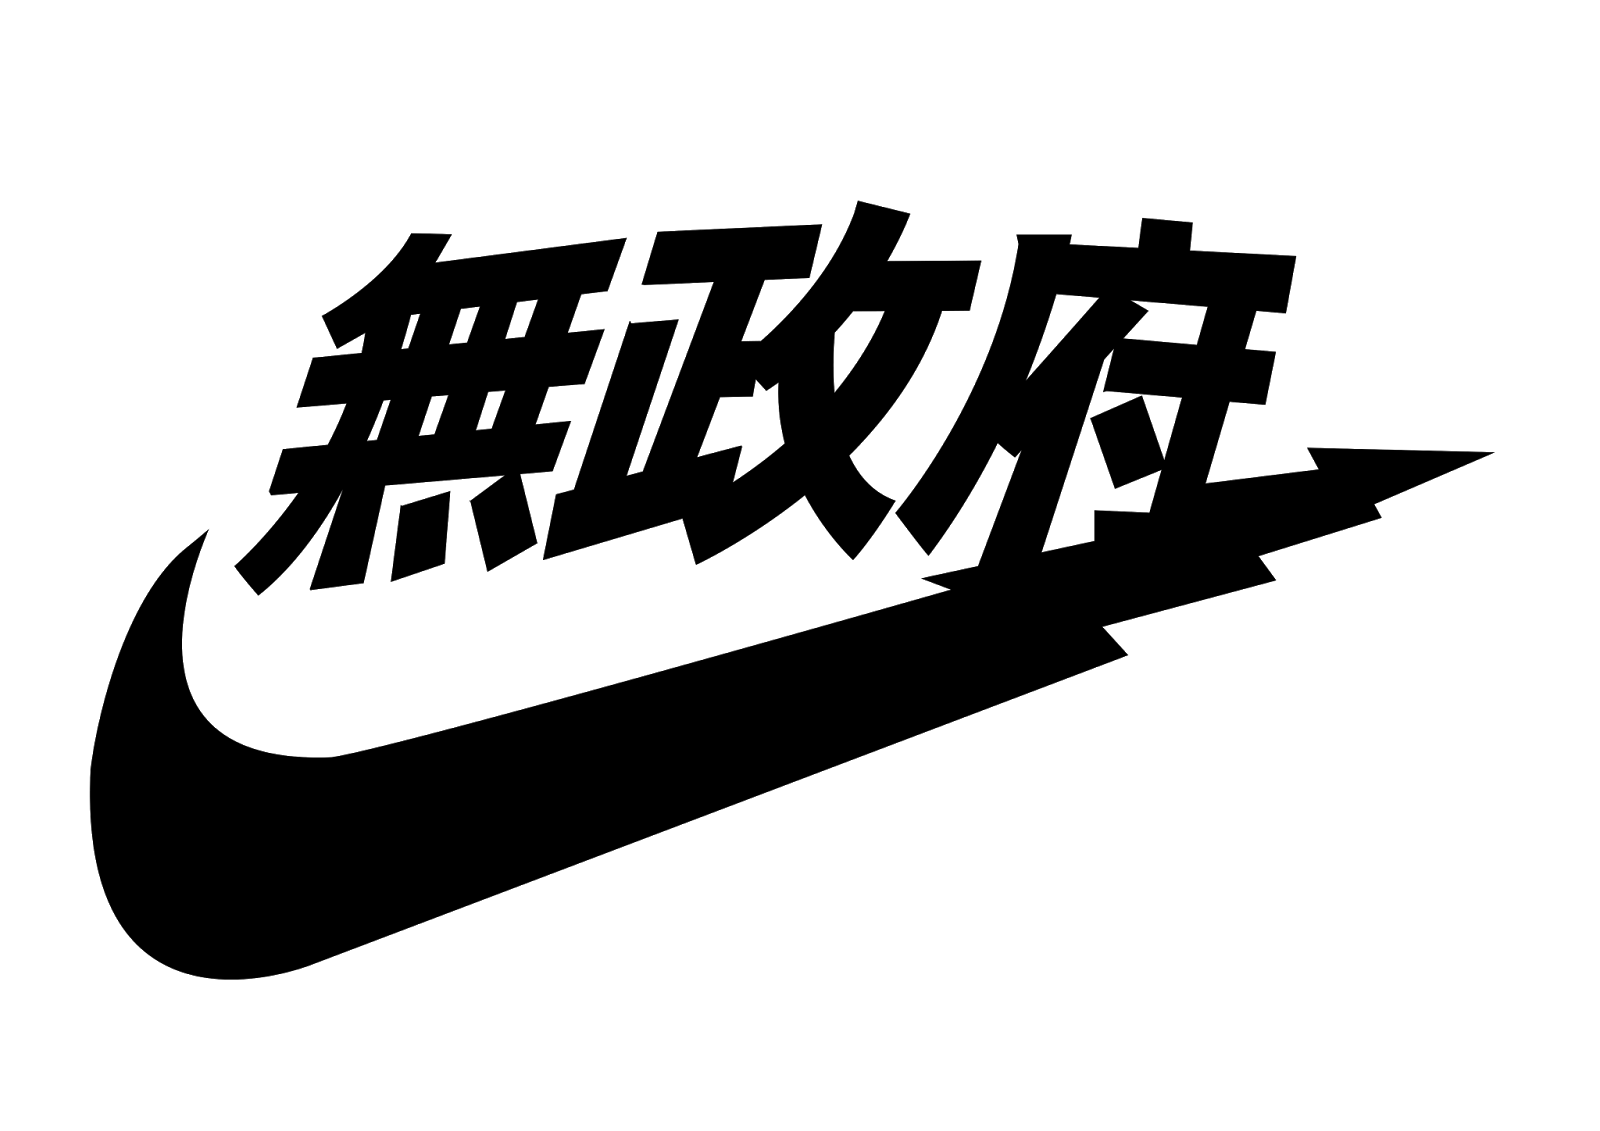 Japanese Nike Wallpapers on WallpaperDog - Nike Logo with Words